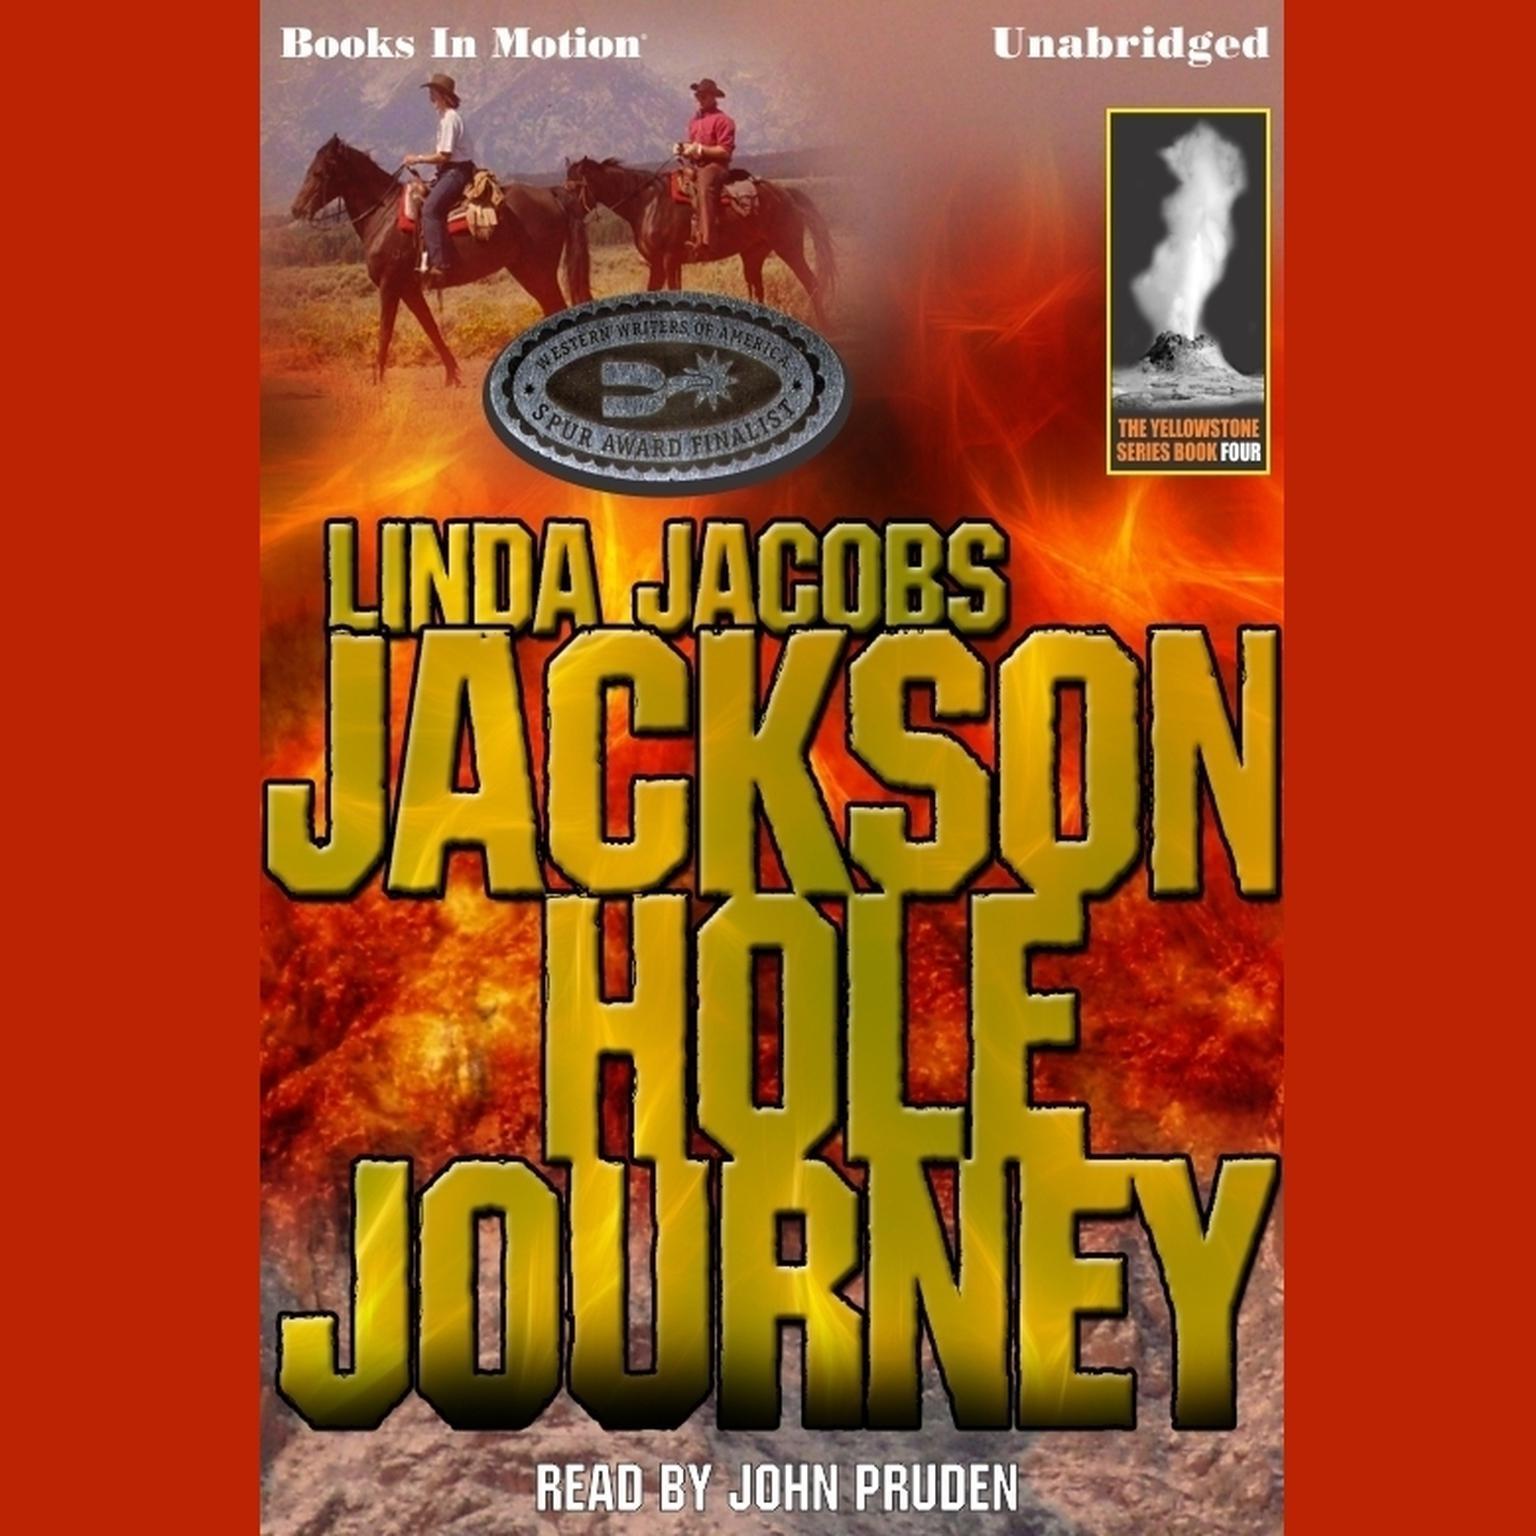 Jackson Hole Journey Audiobook, by Linda Jacobs